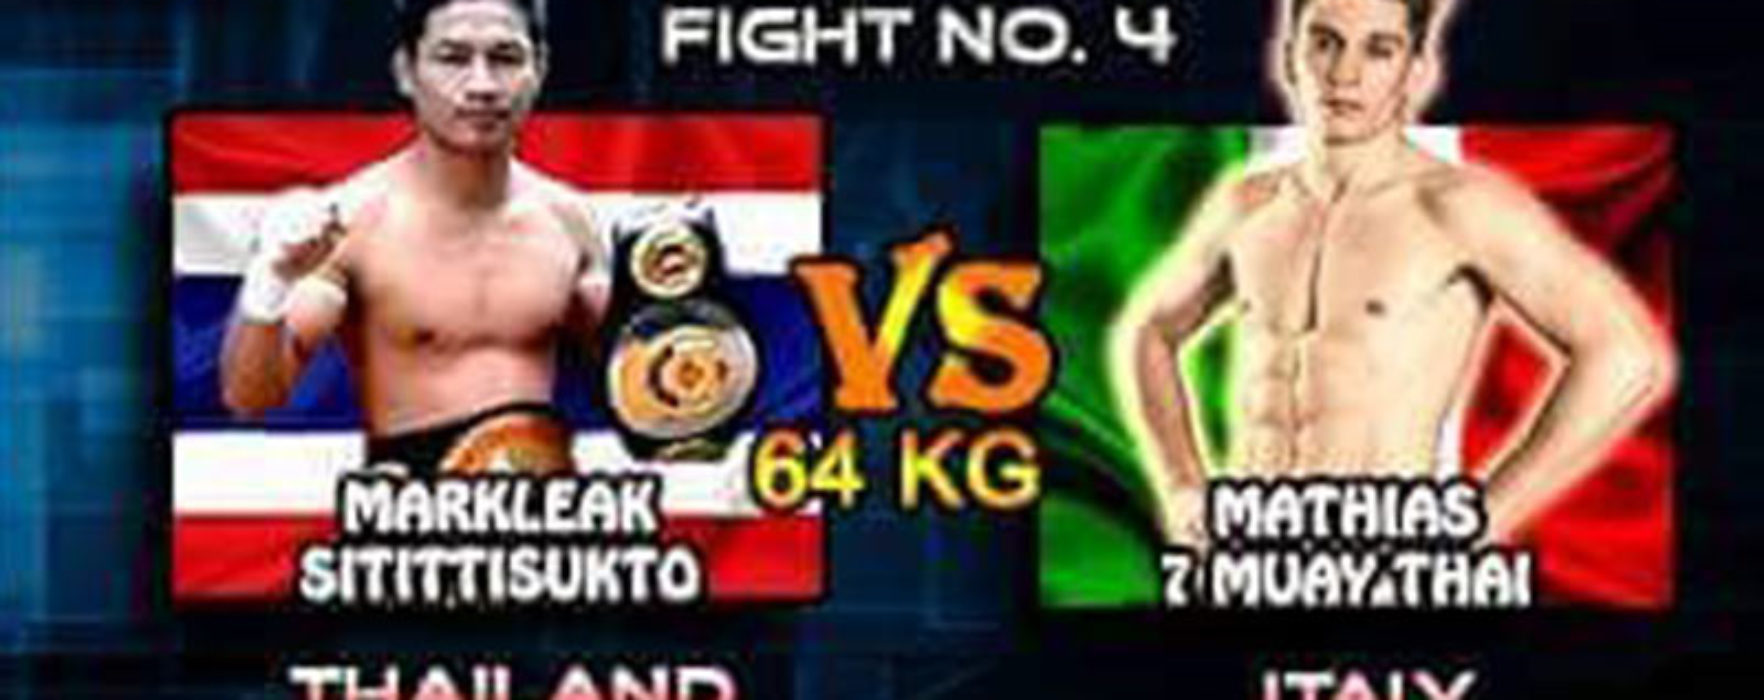 (English) Flash News: Naruto Banchamek forfaits, new opponent for Mathias Gallo Cassarino at Super Muay Thai